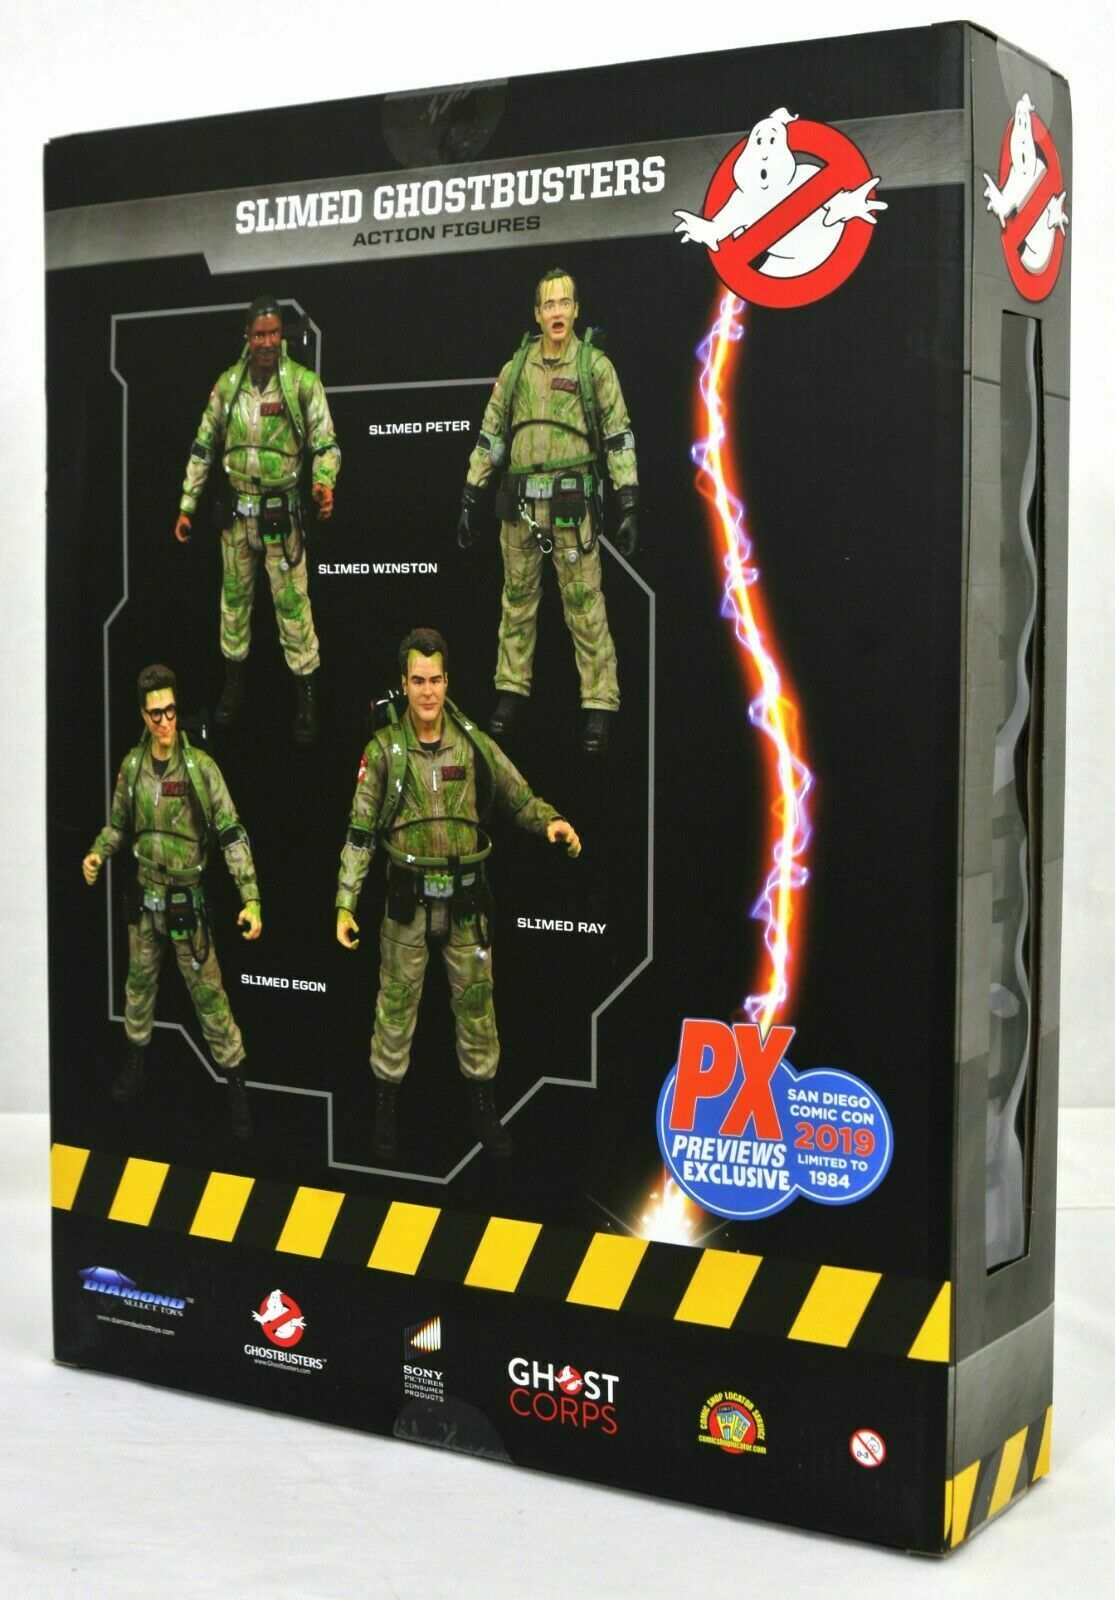 Ghostbusters Action Figure Box Set PX Preview Diamond Select SDCC 2019 Ltd 1984